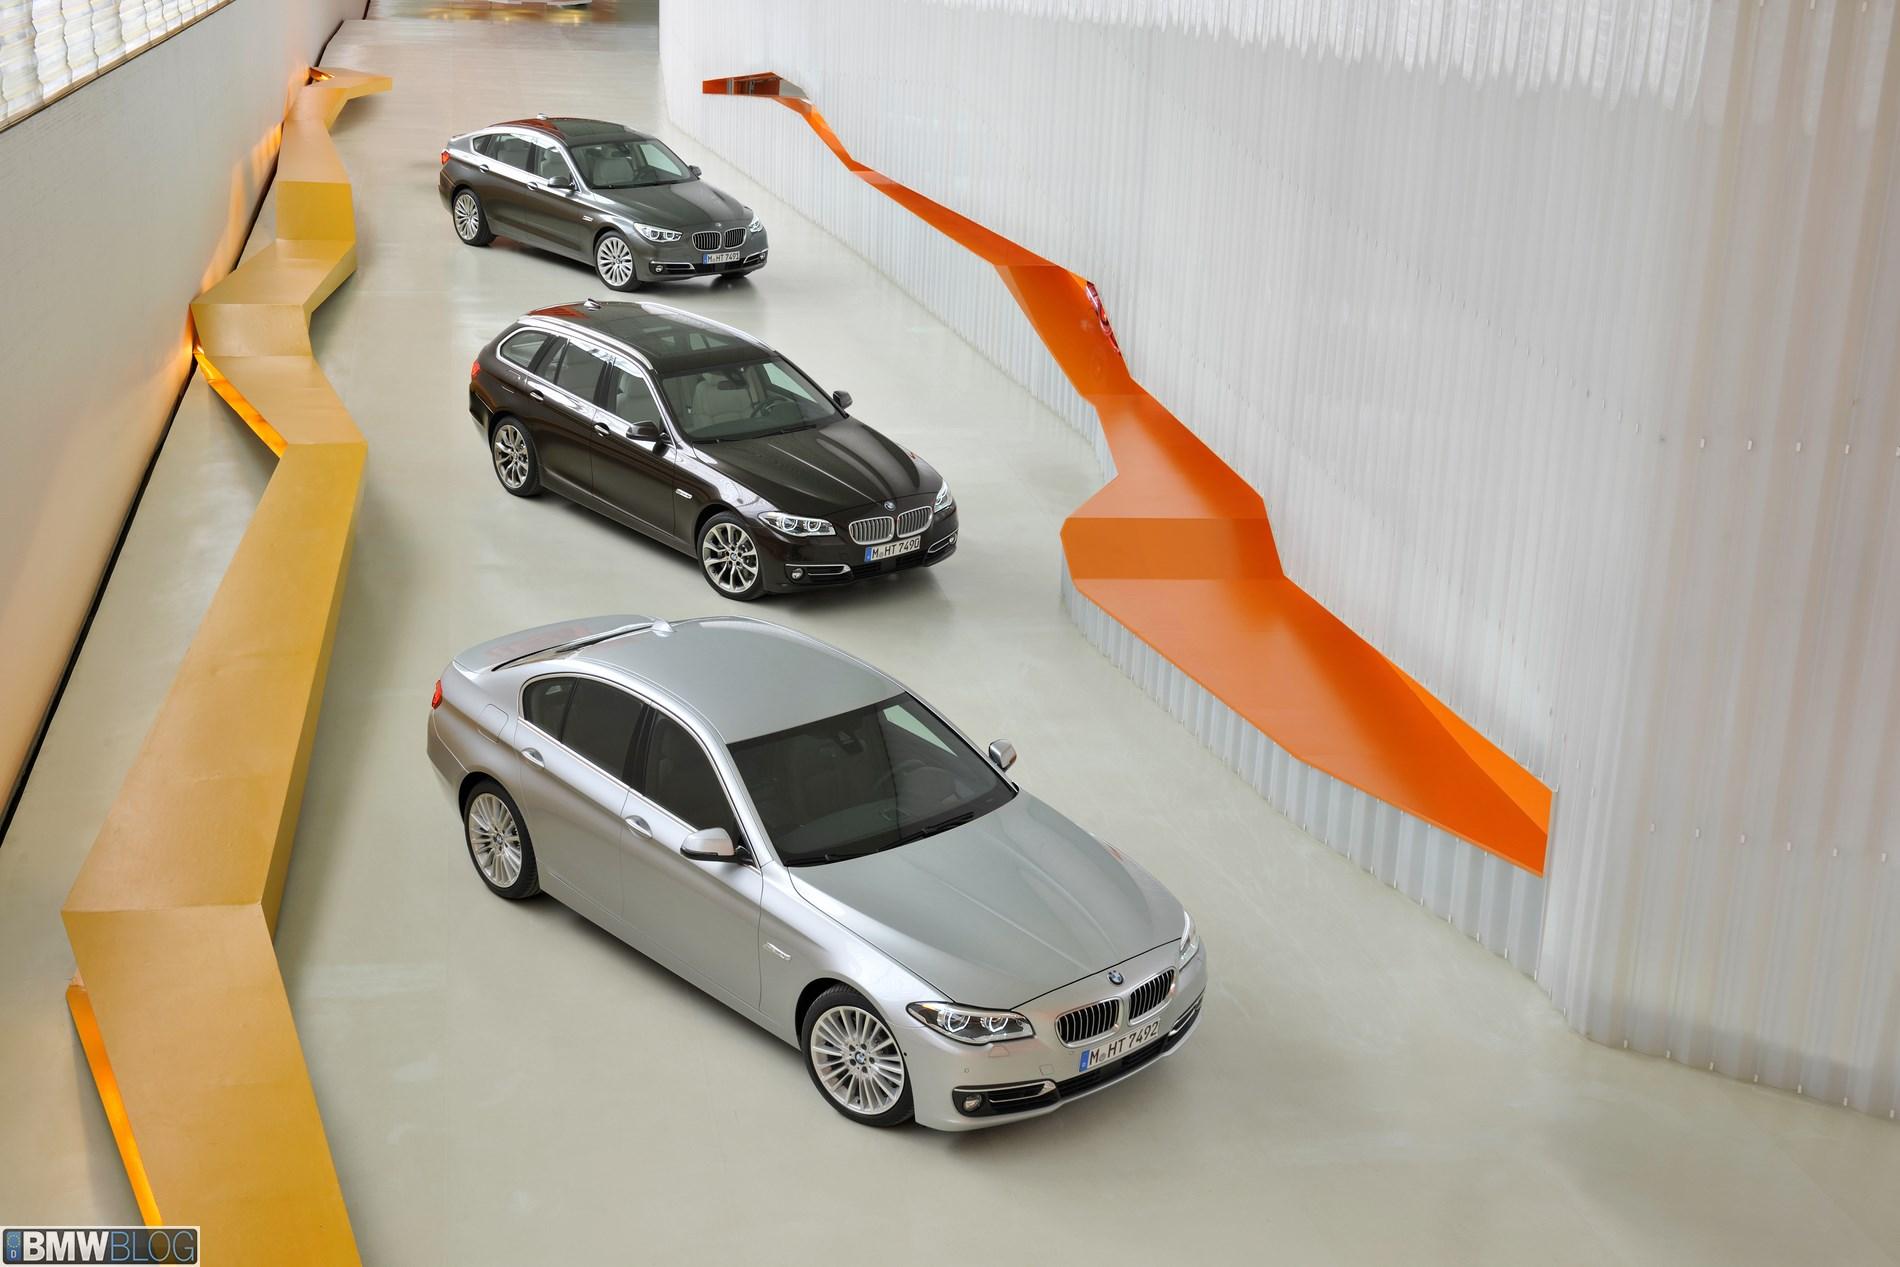 BMW показало рост продаж. Производство 5-й серии BMW рестайлинг